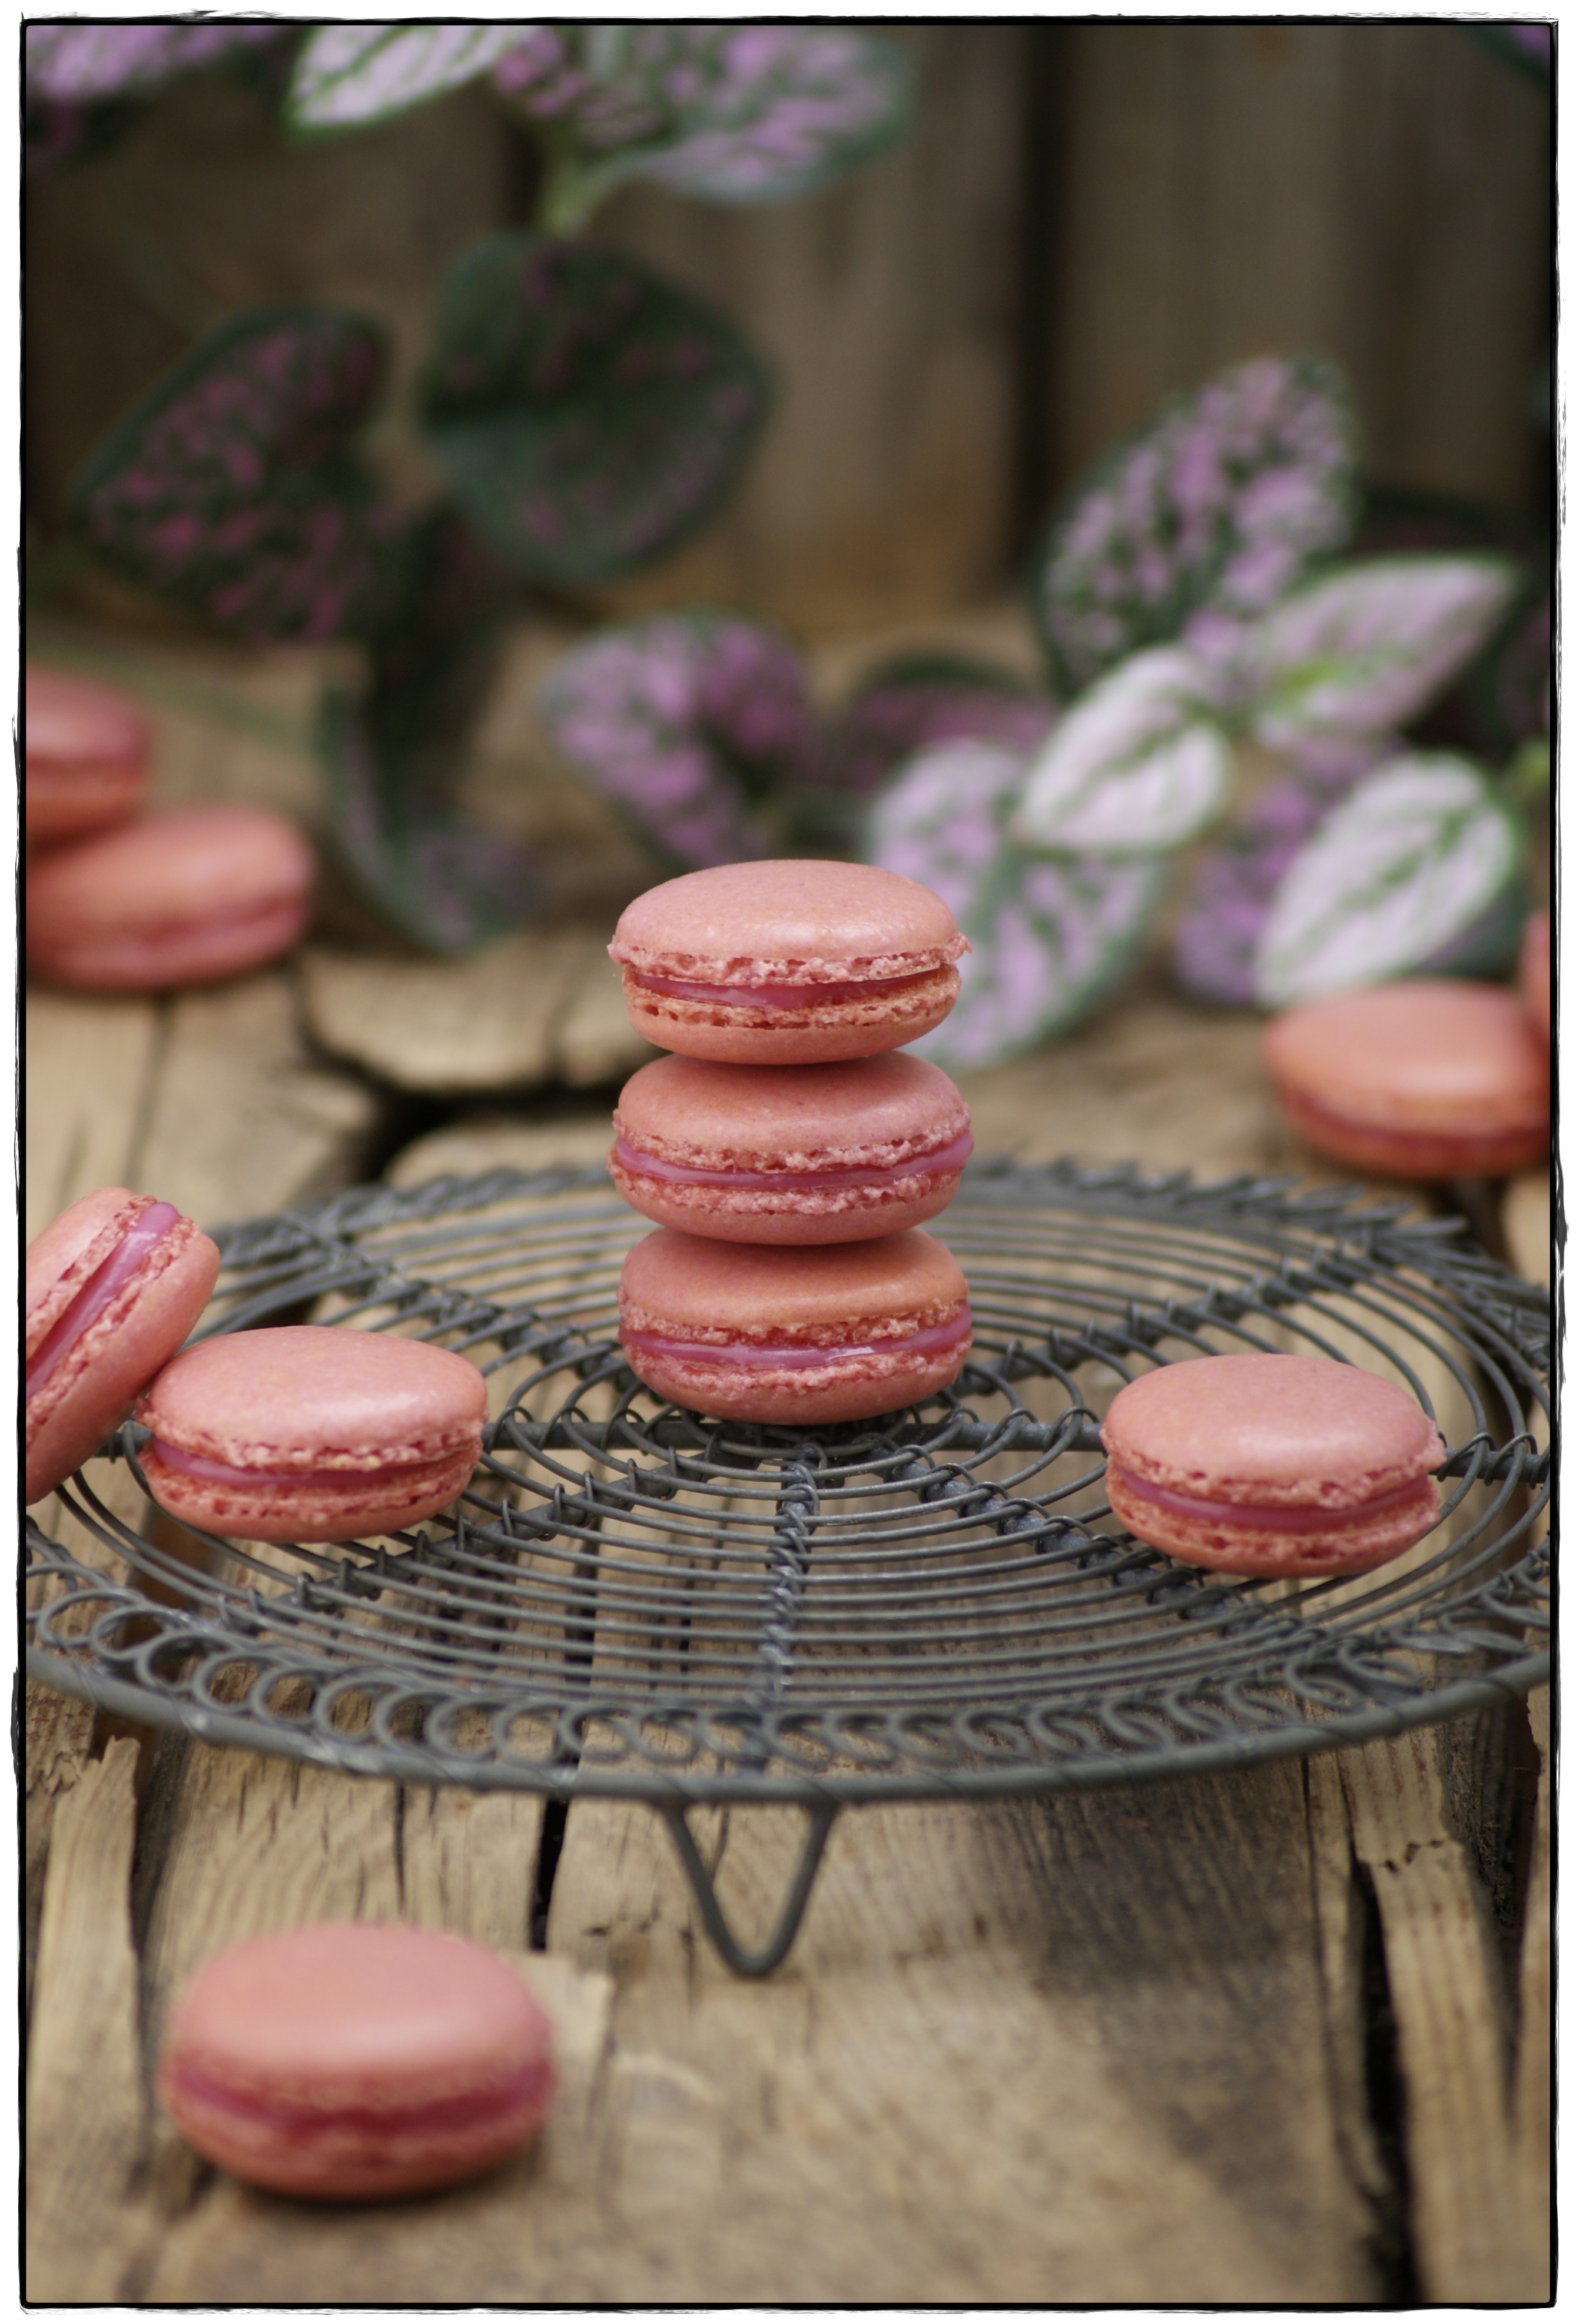 macarons de frambuesa 3.JPG